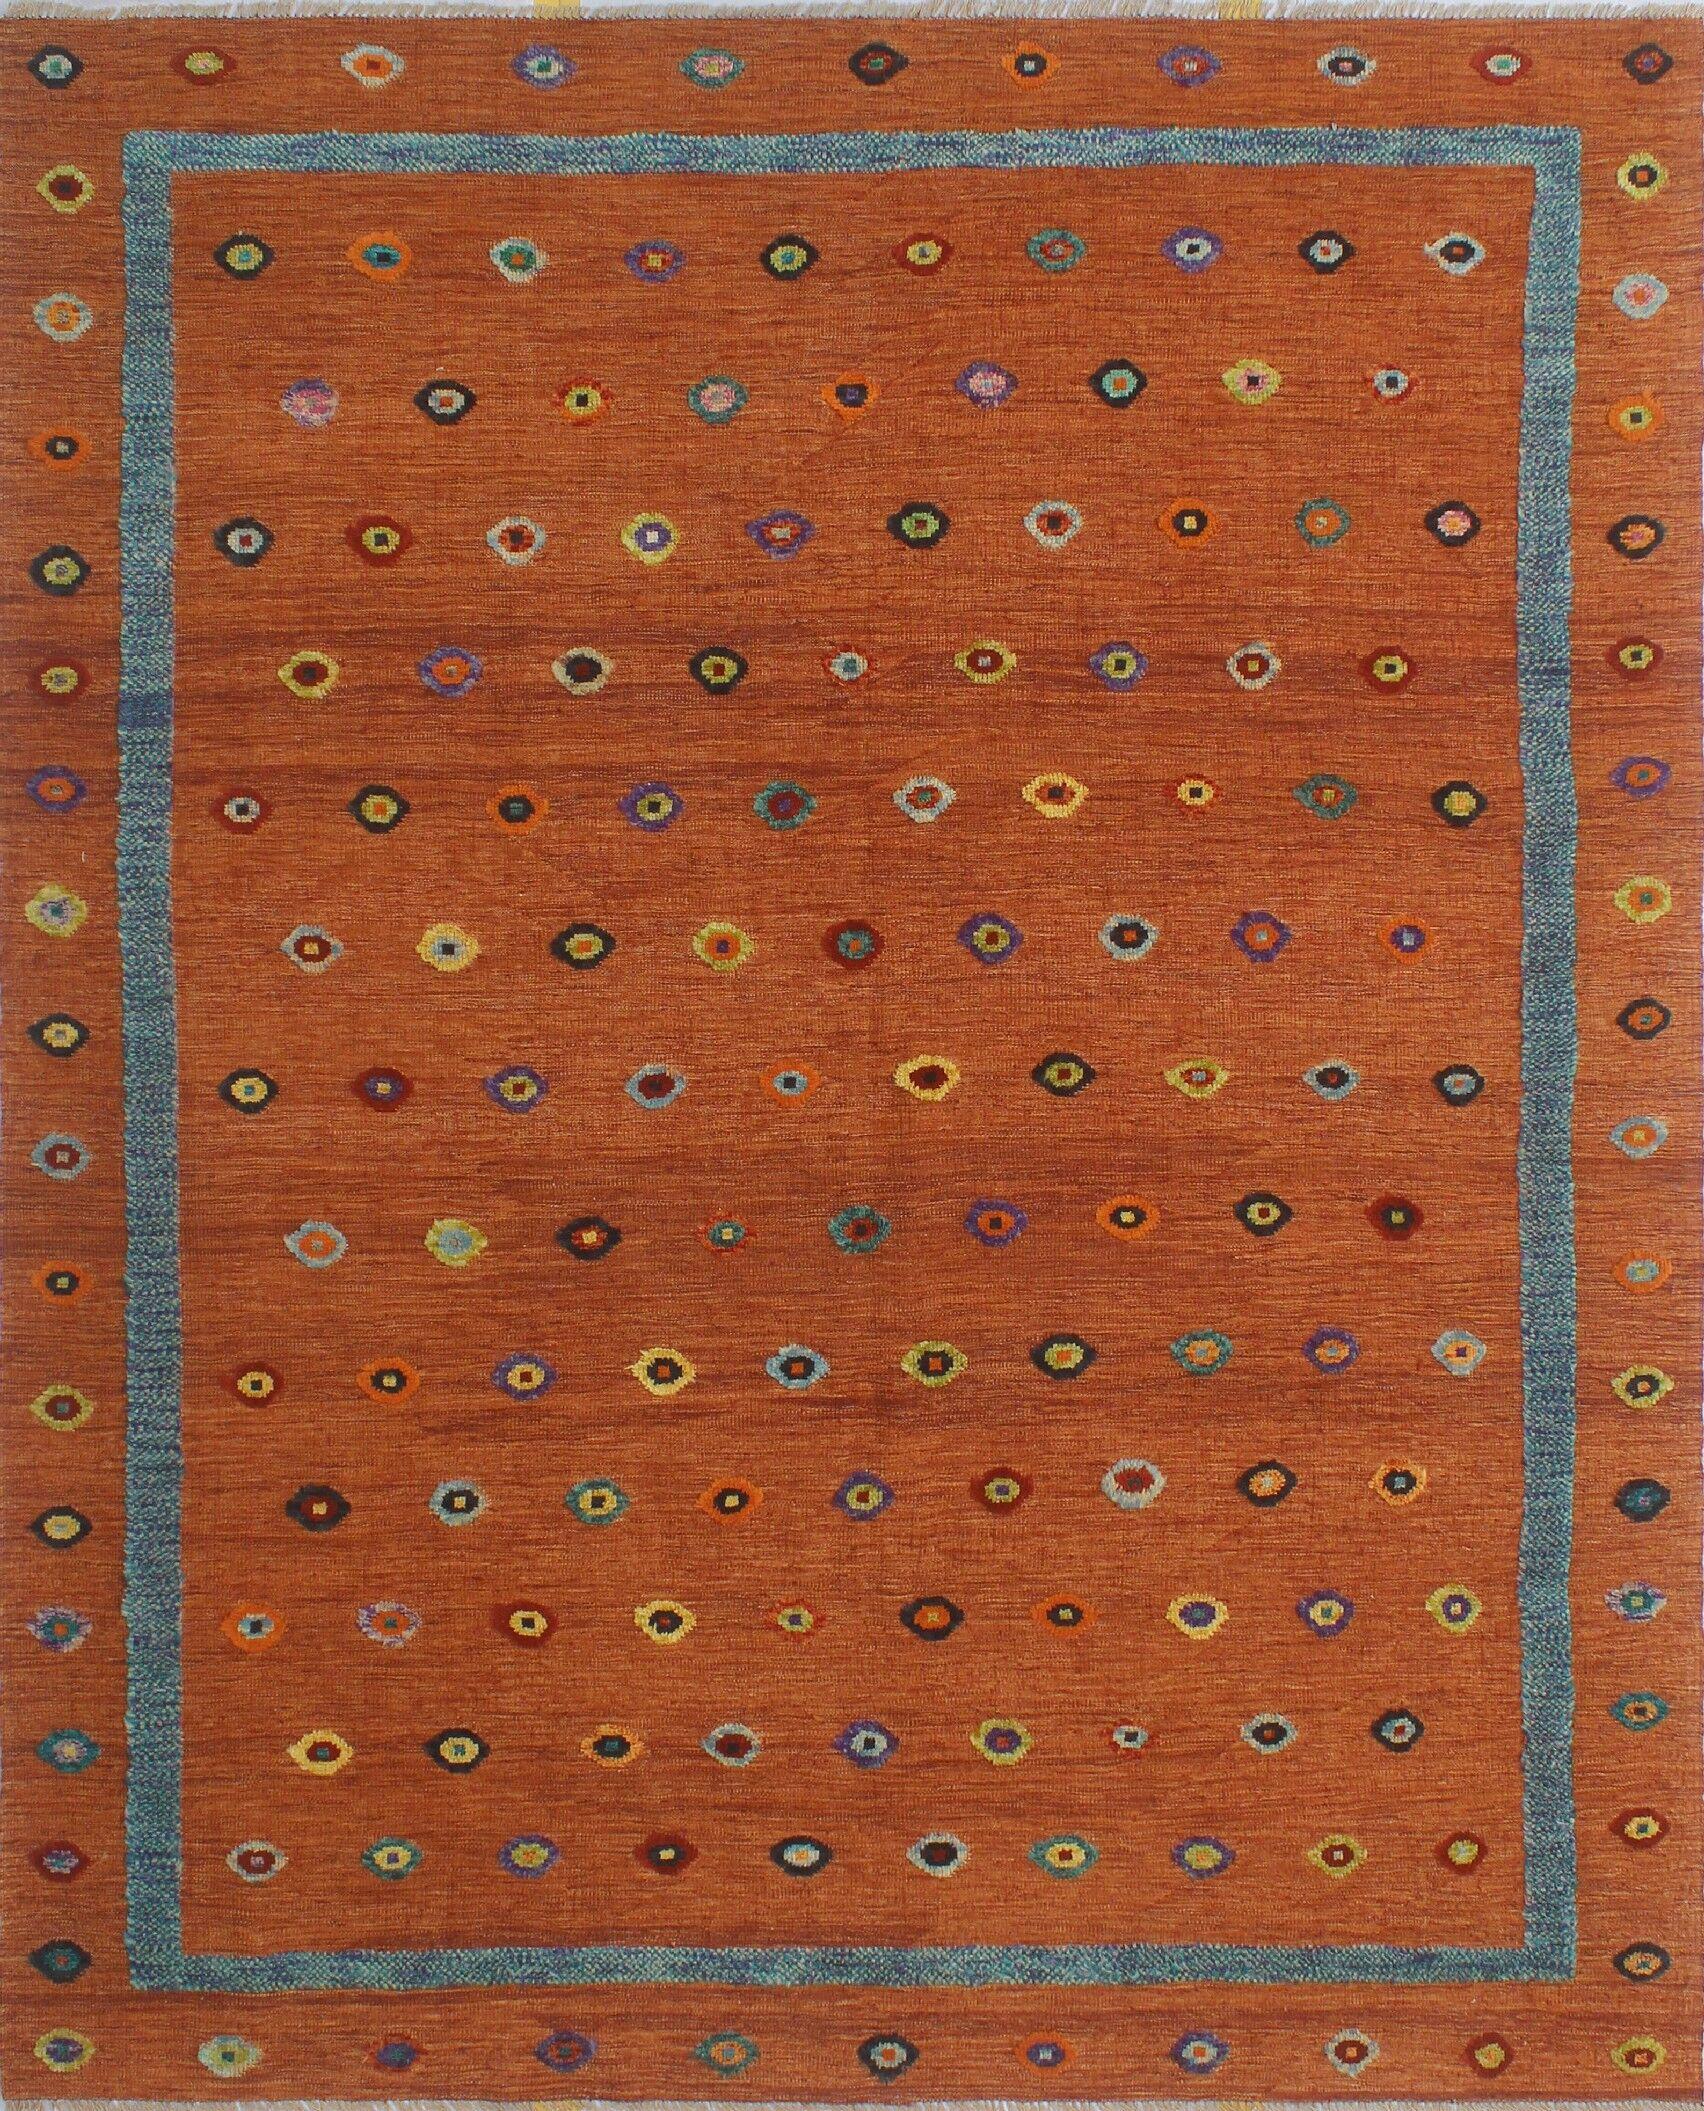 Creola Hand-Knotted Wool Orange Area Rug